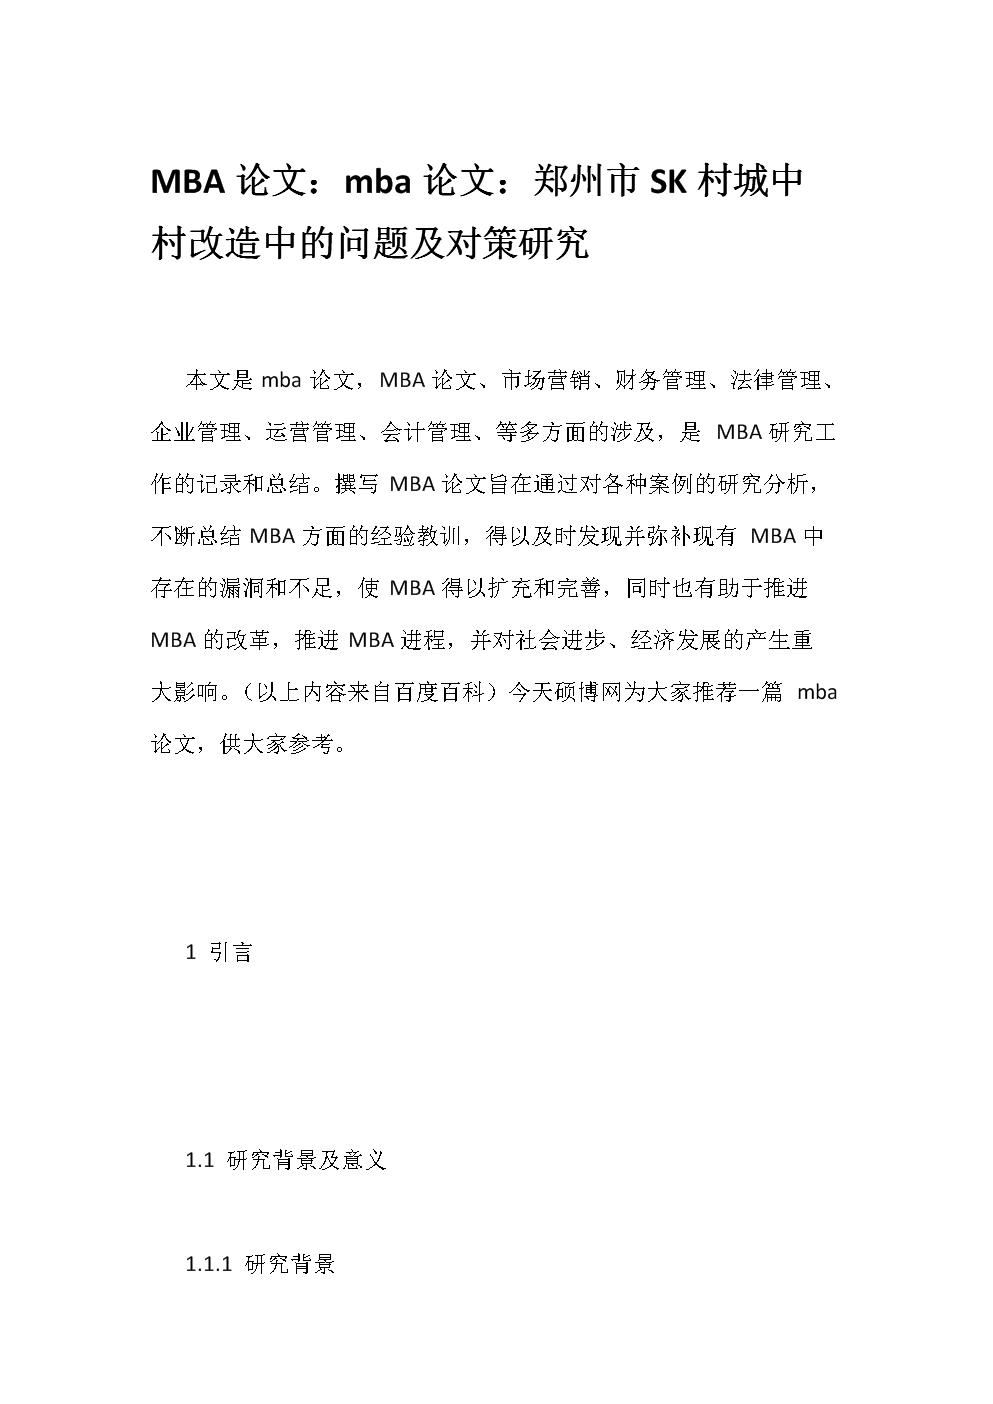 MBA论文:mba论文:郑州市SK村城中村改造中的问题及对策研究.docx